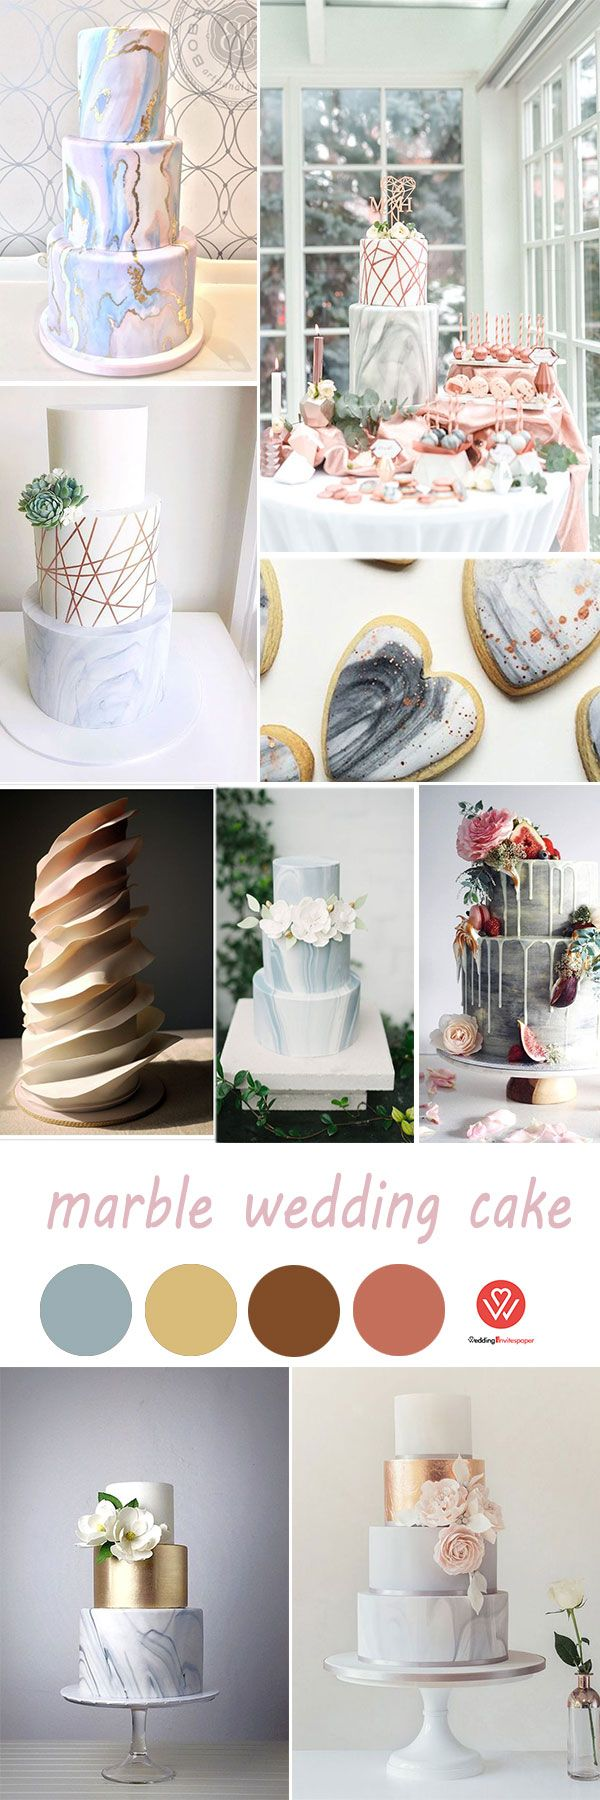 10 Most Popular Elements In Modern Wedding rustic wedding cakes